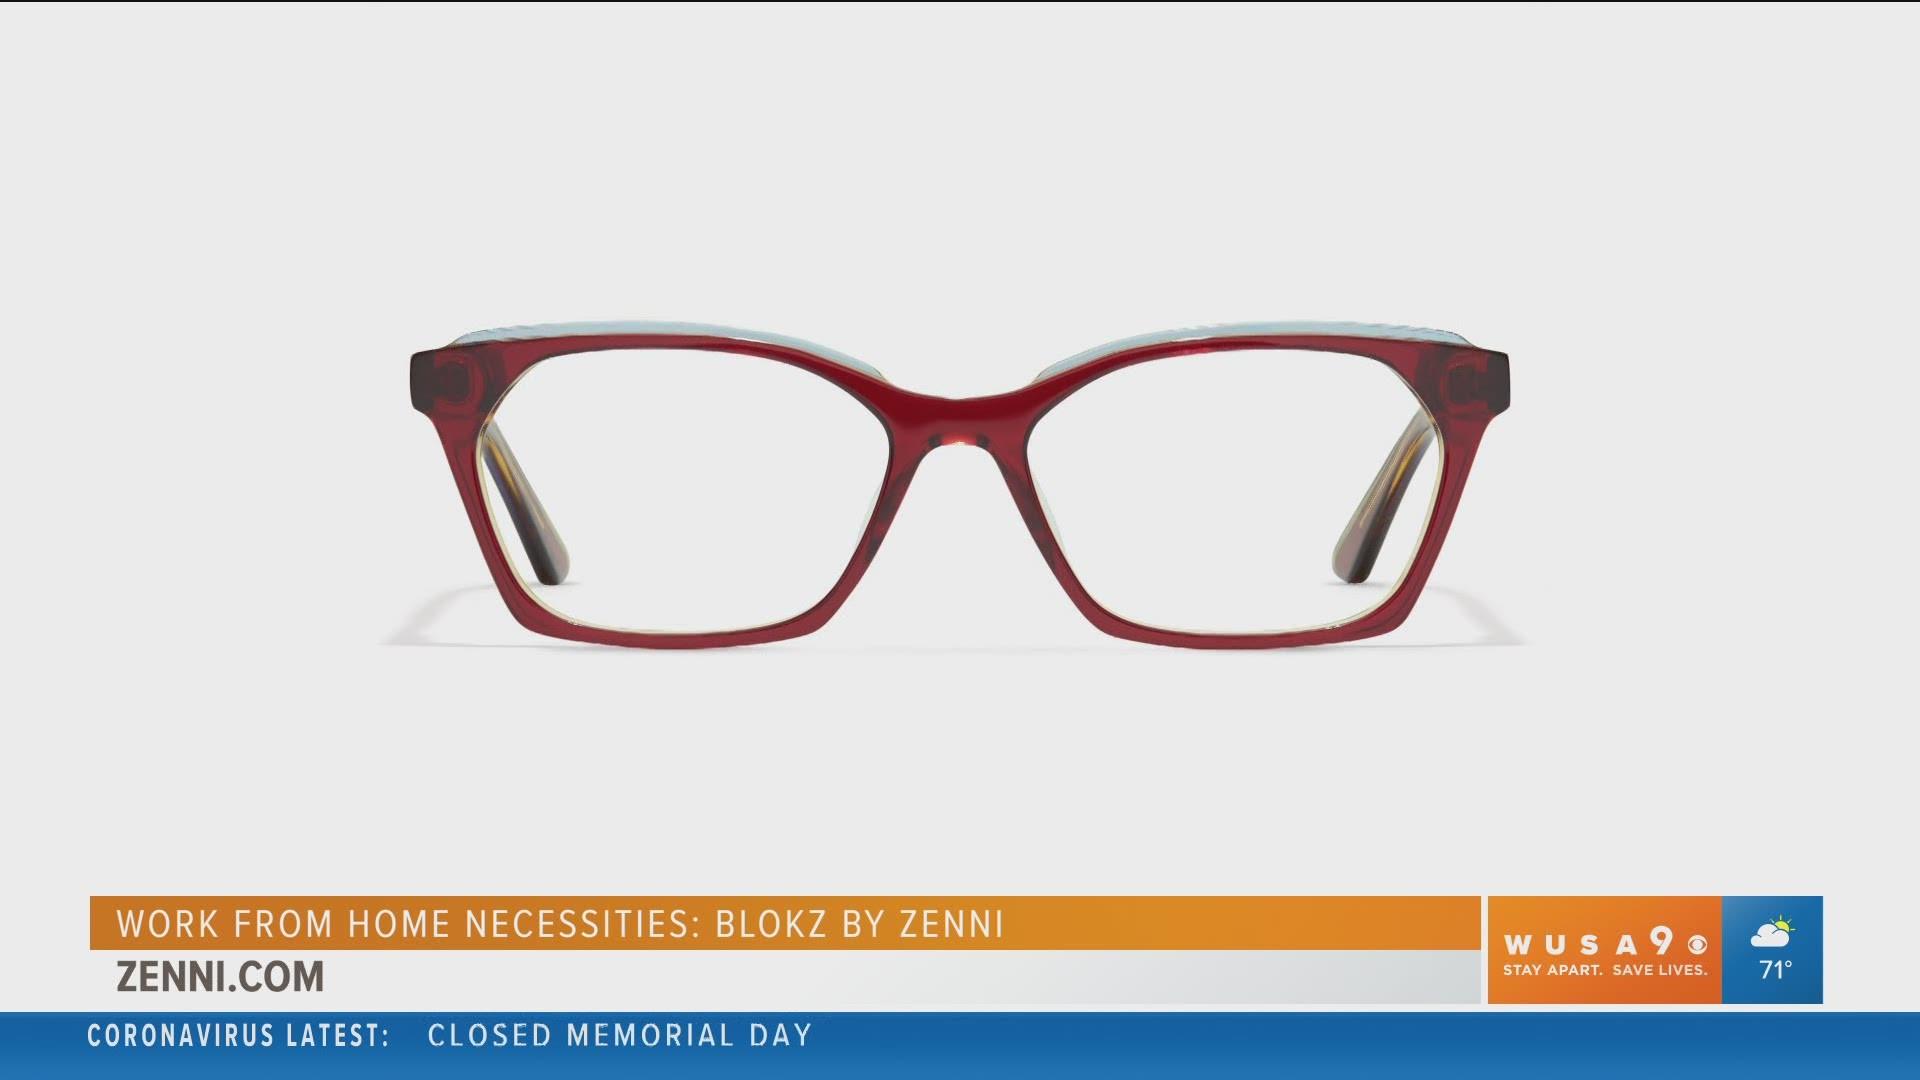 Zenni Blokz Blue Light Blocking Glasses That Help Combat